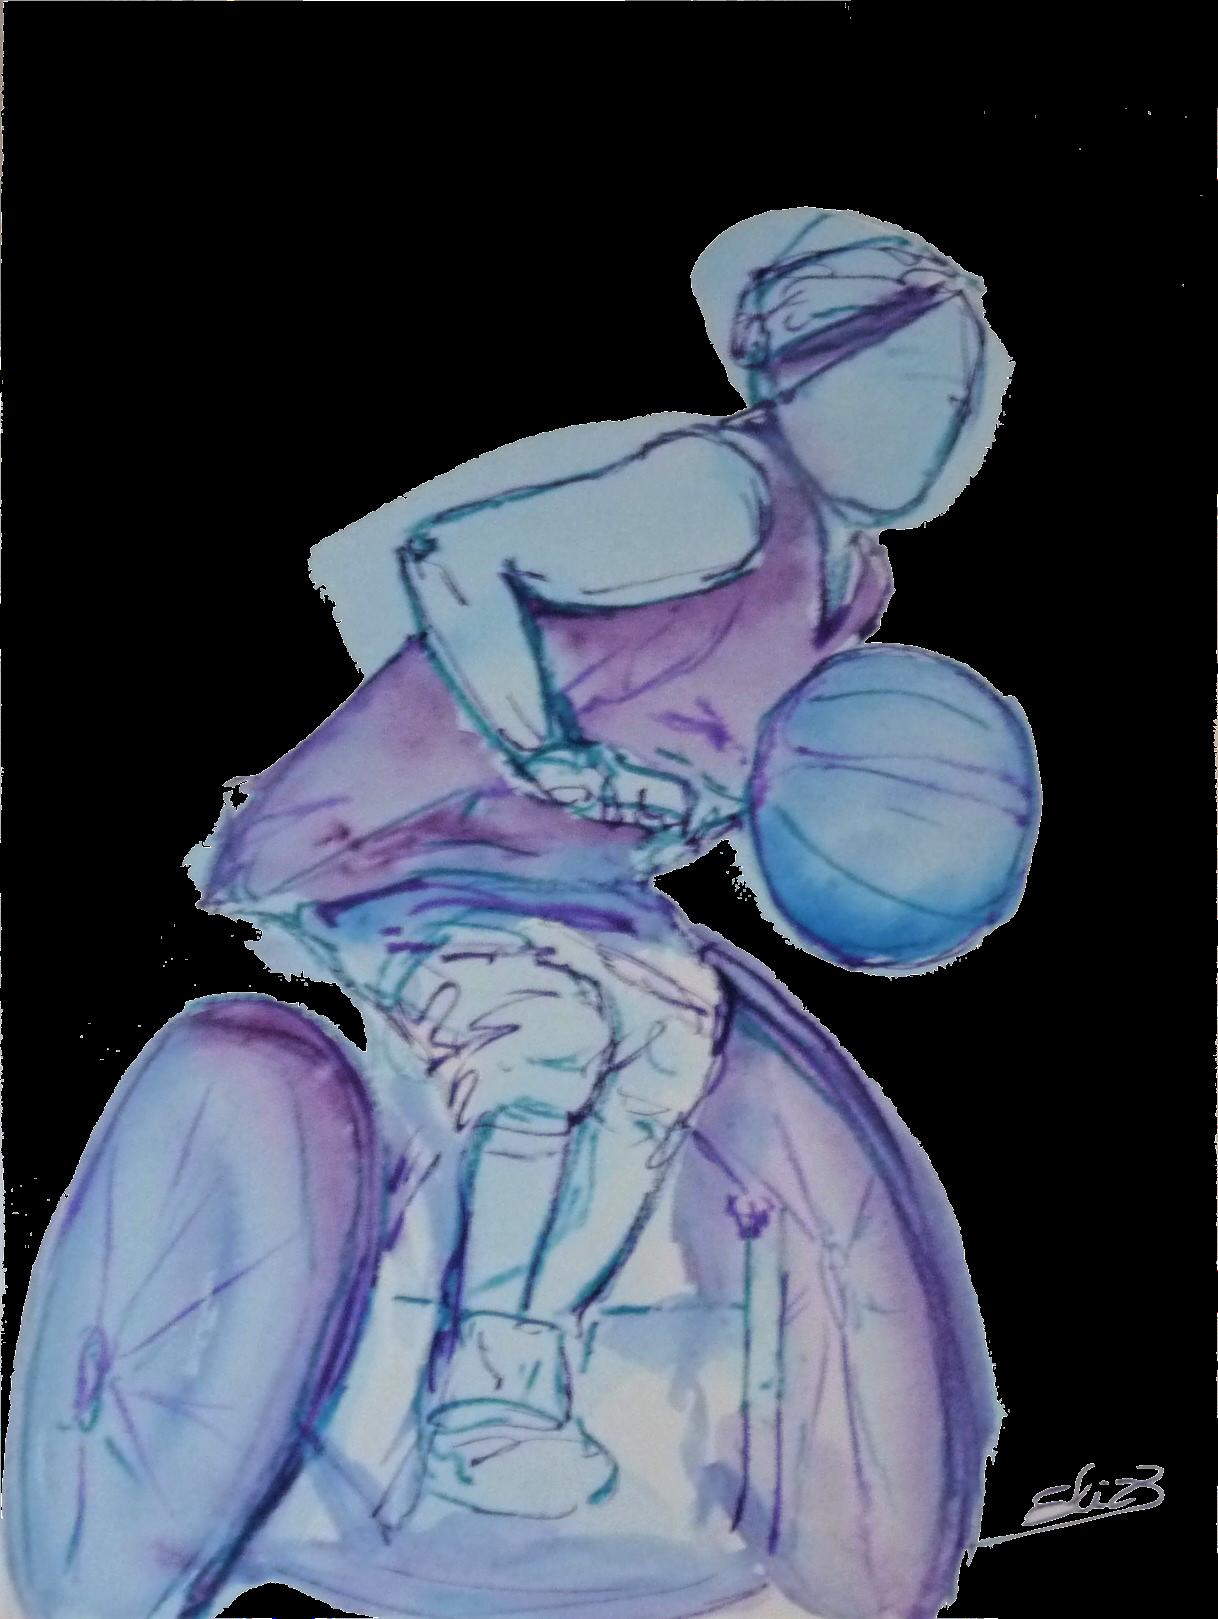 handicape basket handisport art esquisse pigmentropie